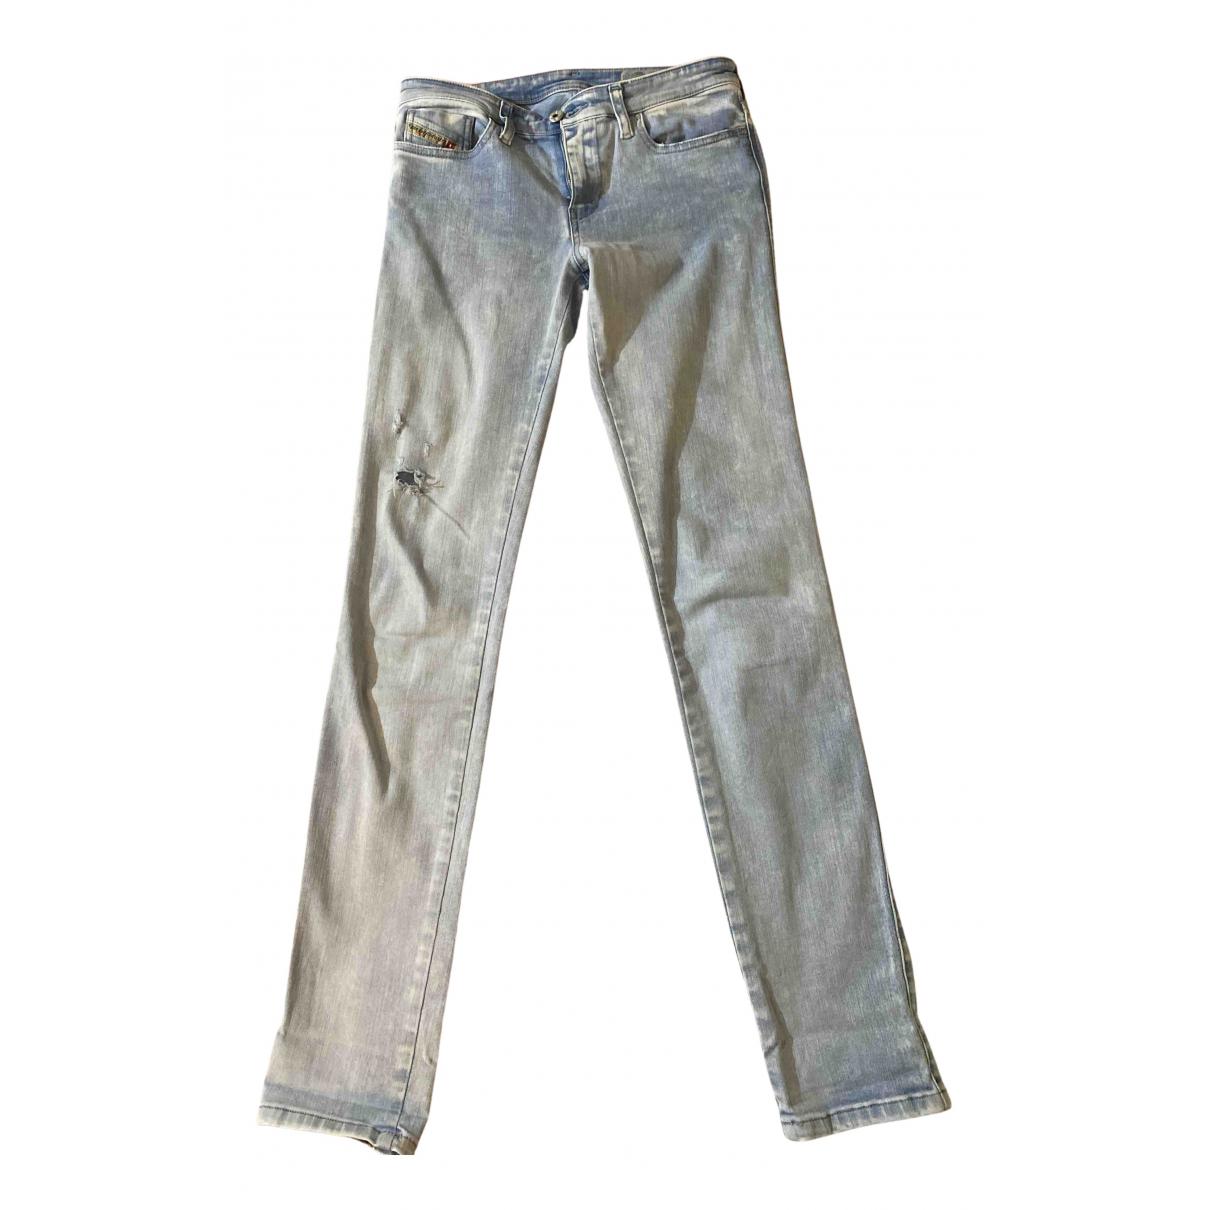 Diesel N Denim - Jeans Jeans for Women 28 US